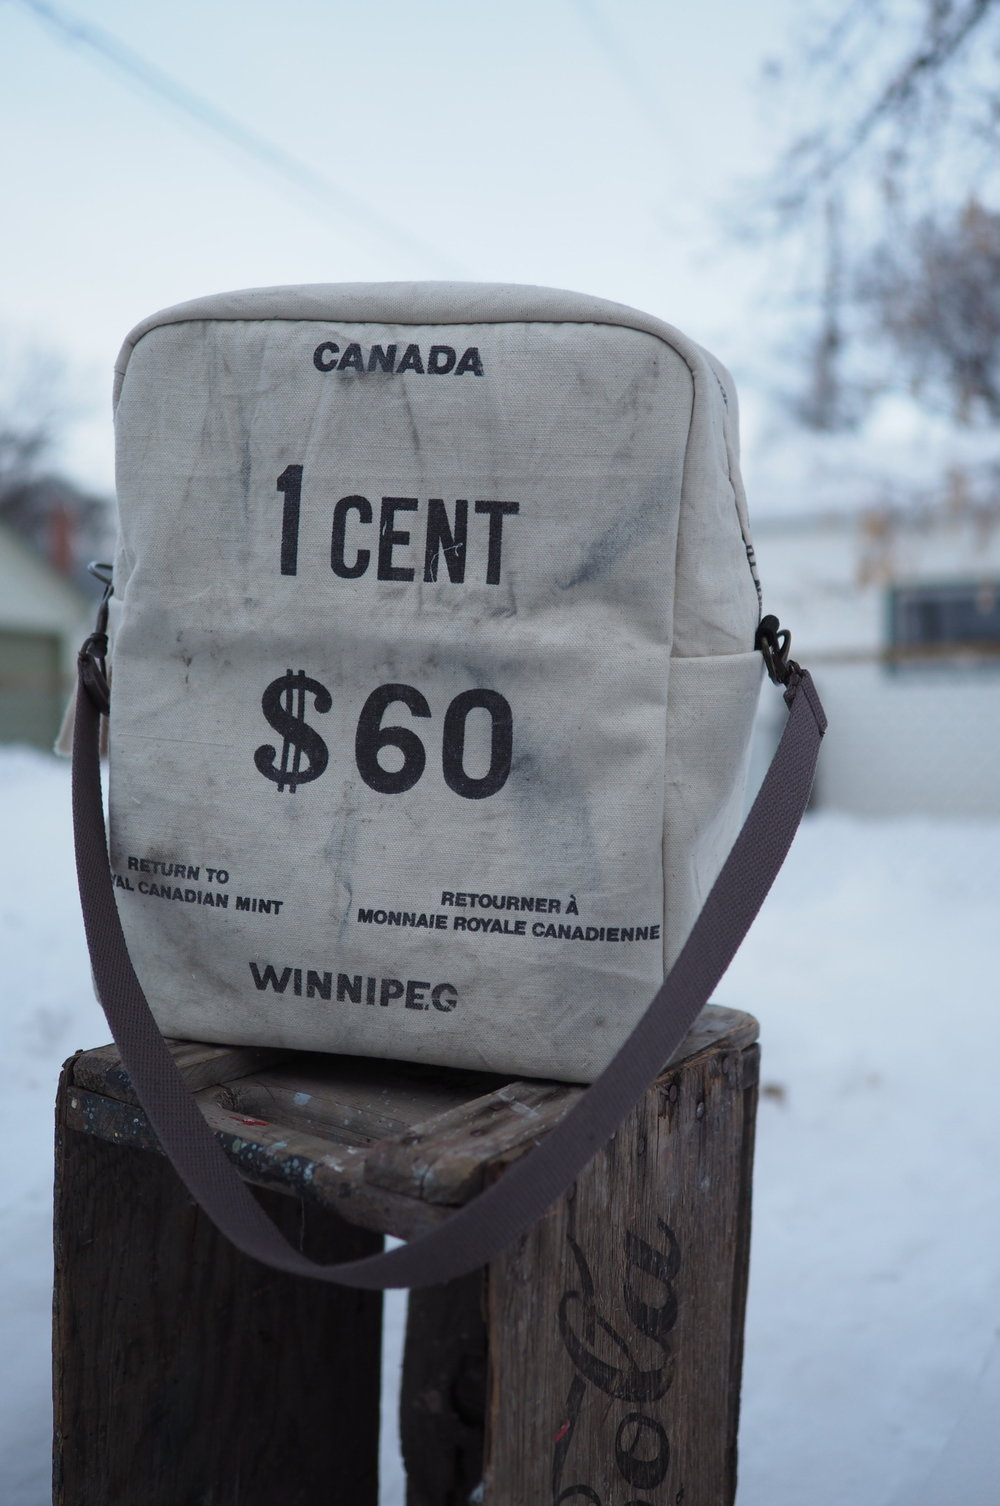 WinnipegNorthOfFargoBag.jpg